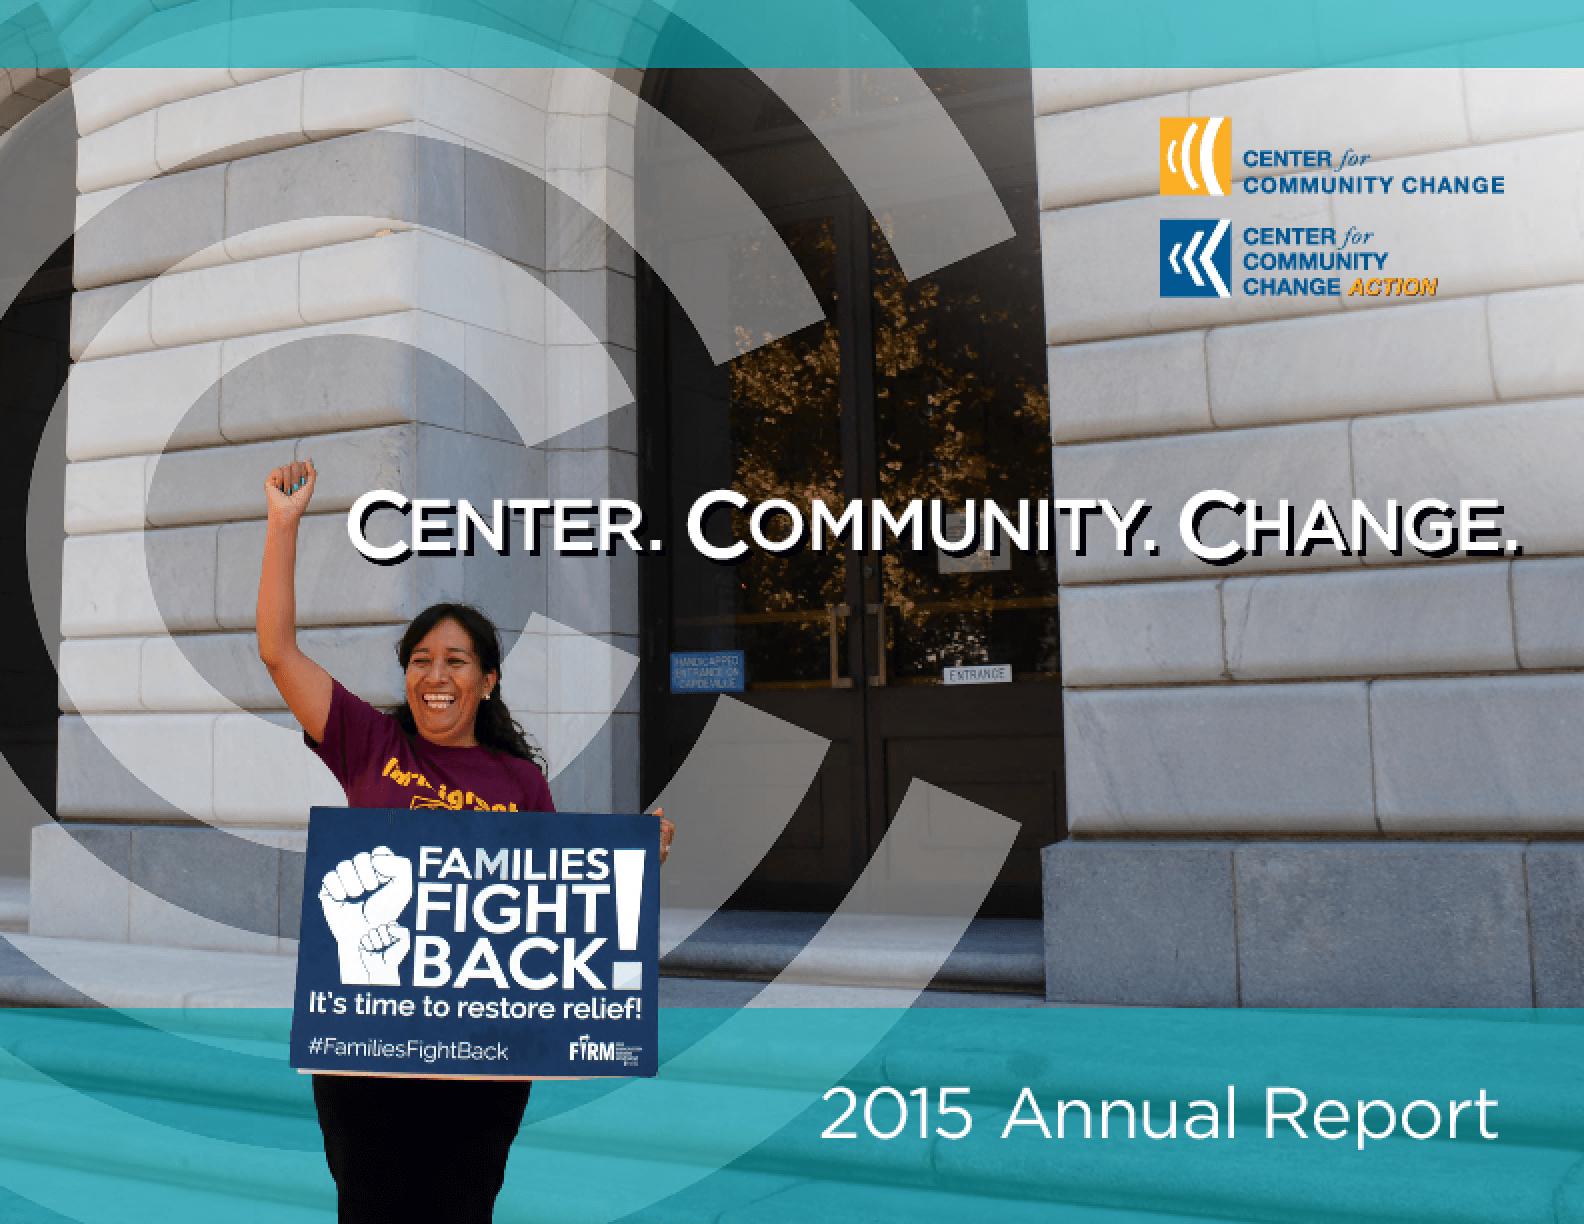 Center. Community. Change. 2015 Annual Report